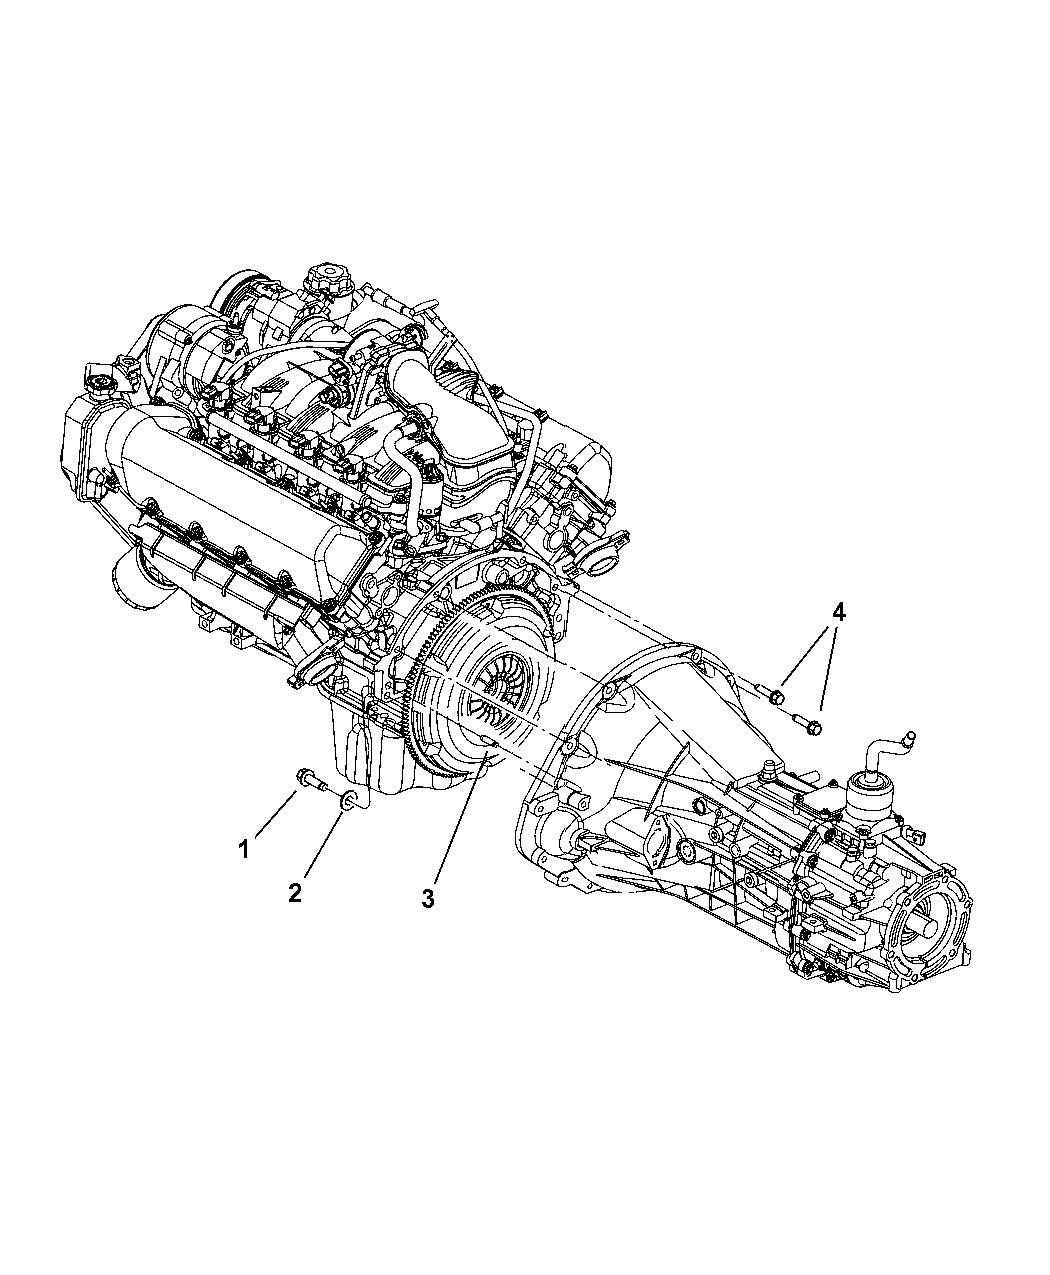 2008 Dodge Ram 1500 Mounting Bolts of Manual Transmission